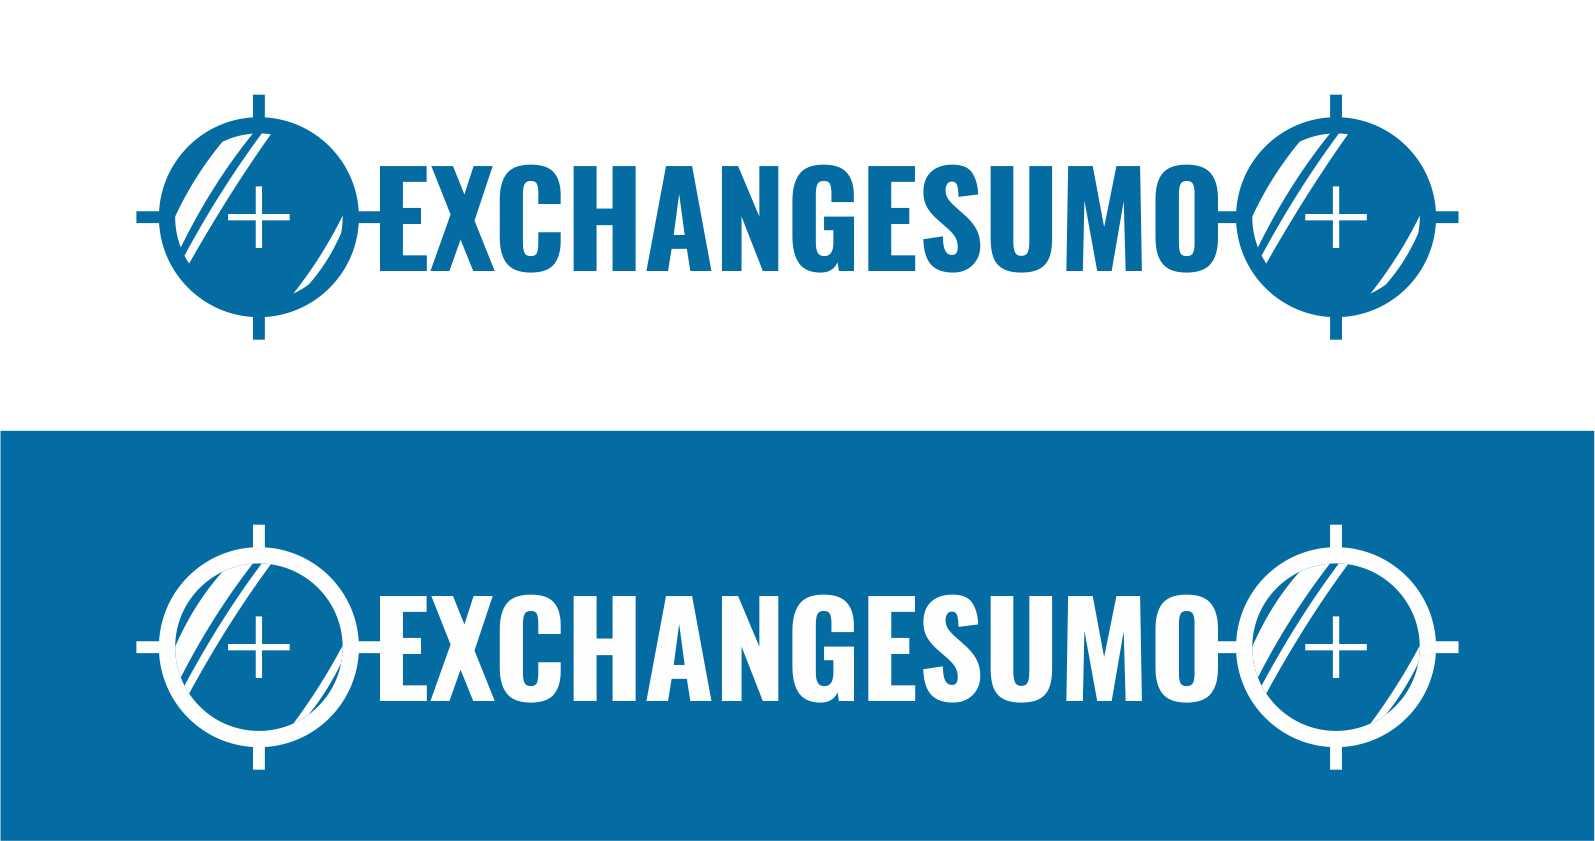 Логотип для мониторинга обменников фото f_7445baa1322877f1.jpg